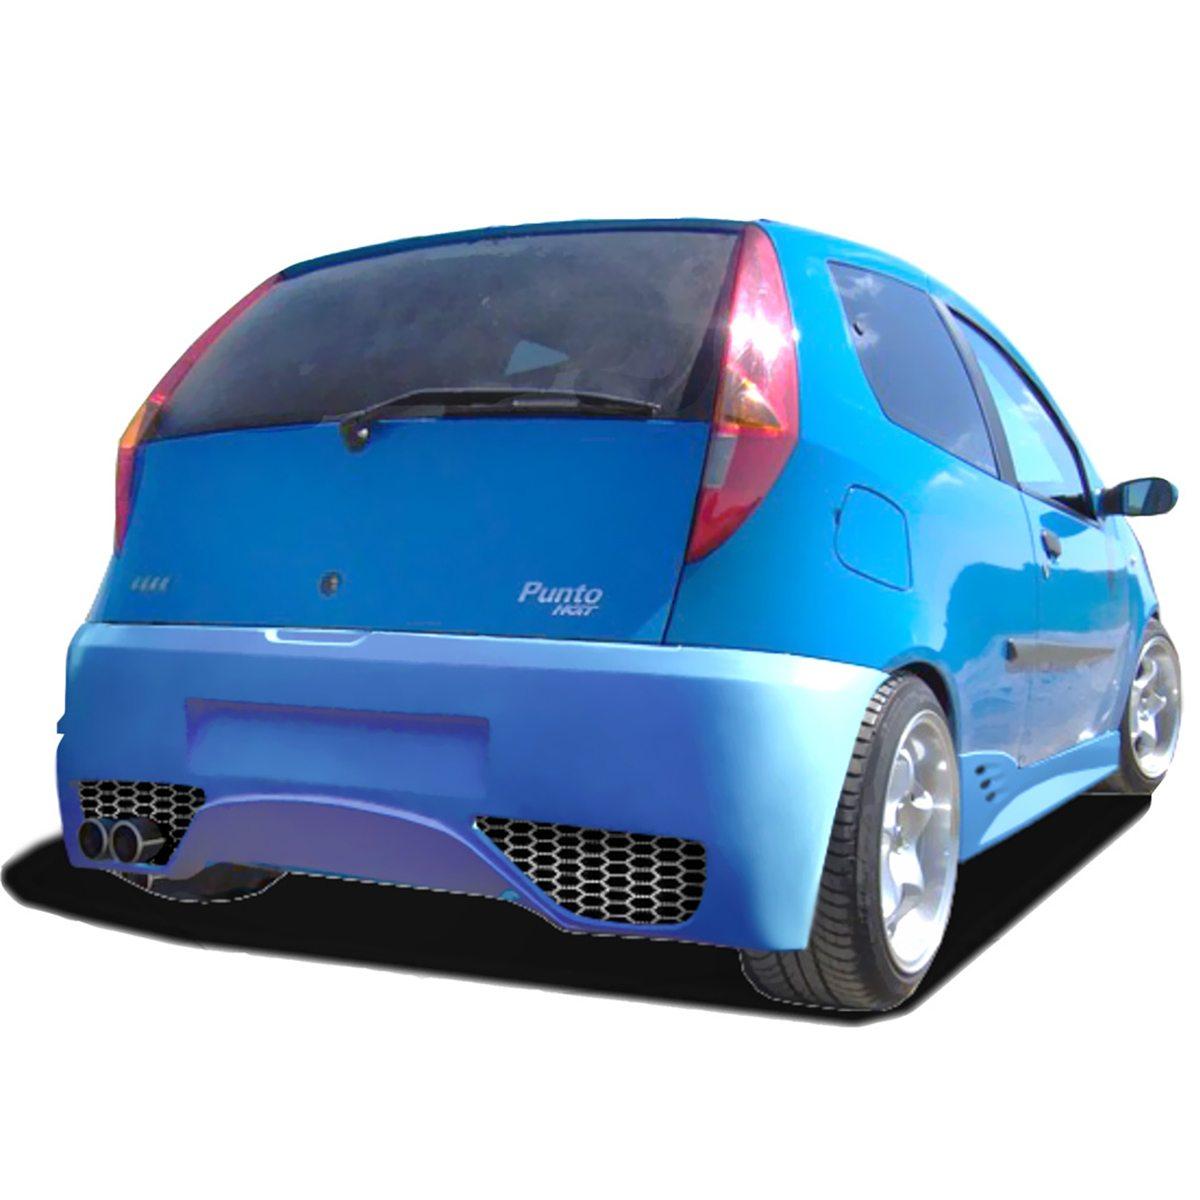 Fiat-Punto-00-3P-Ghost-Trás-PCU0240.2